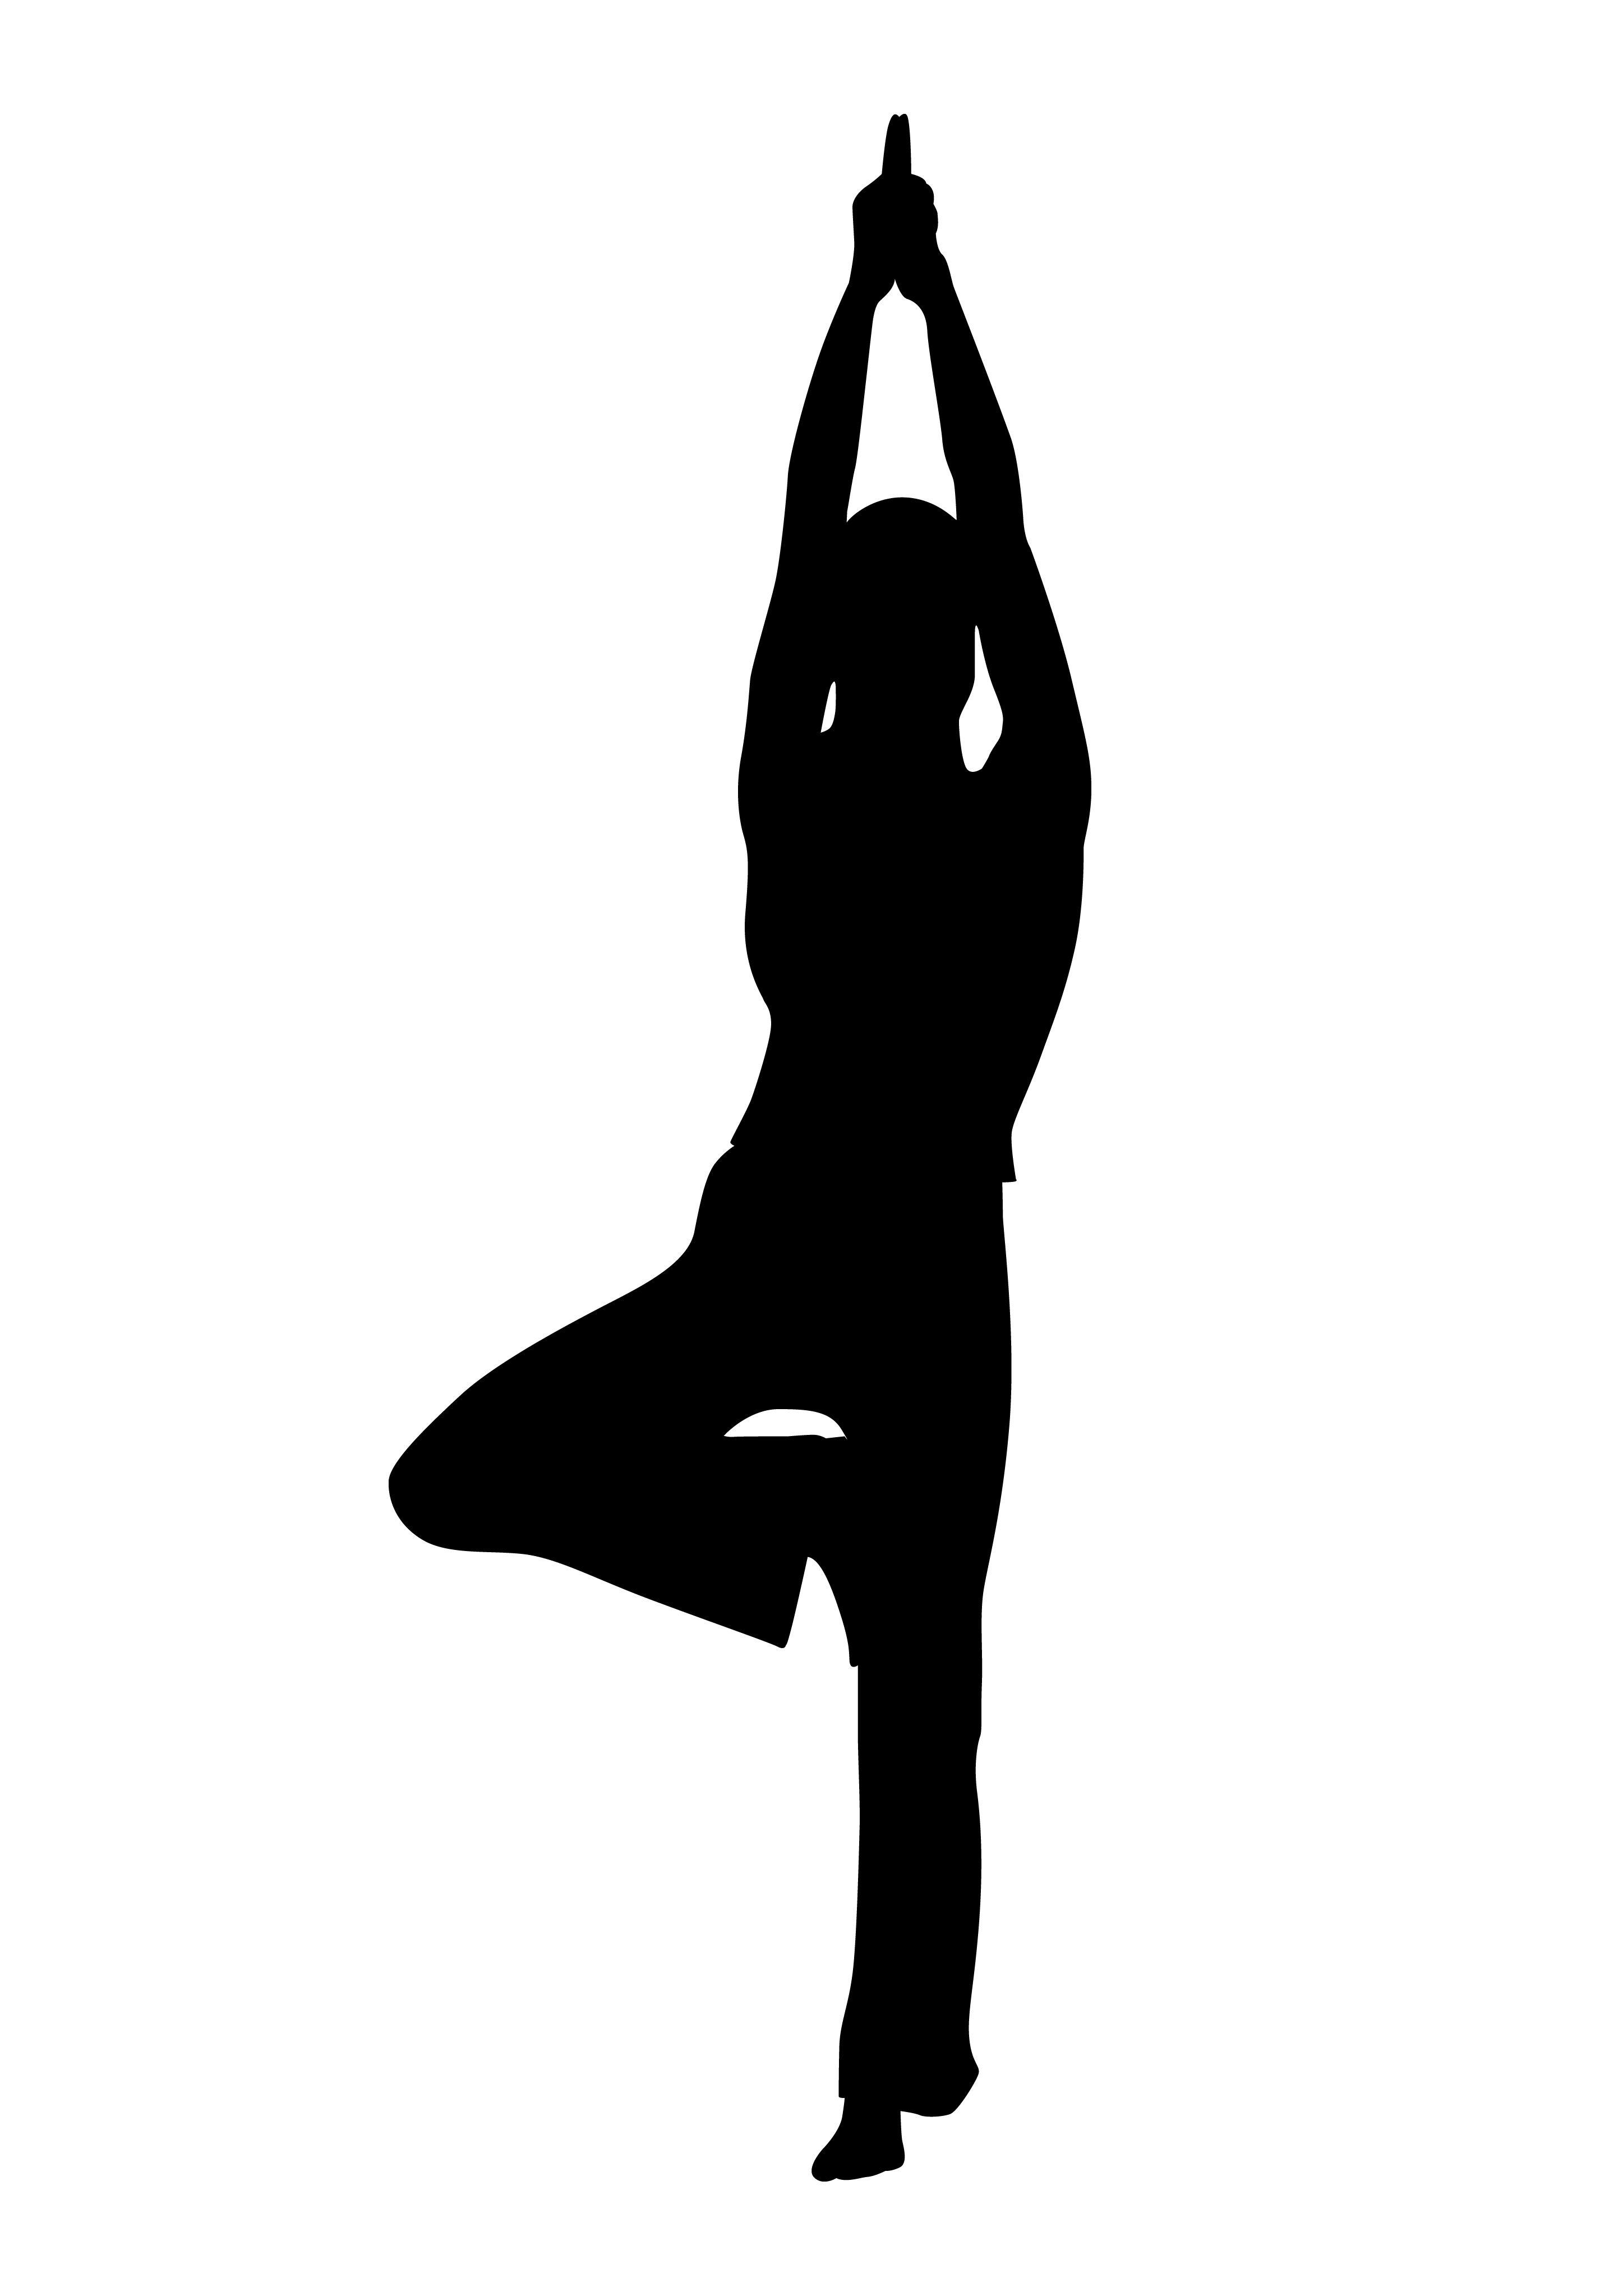 Meditation clipart yaga. Pin on yoga